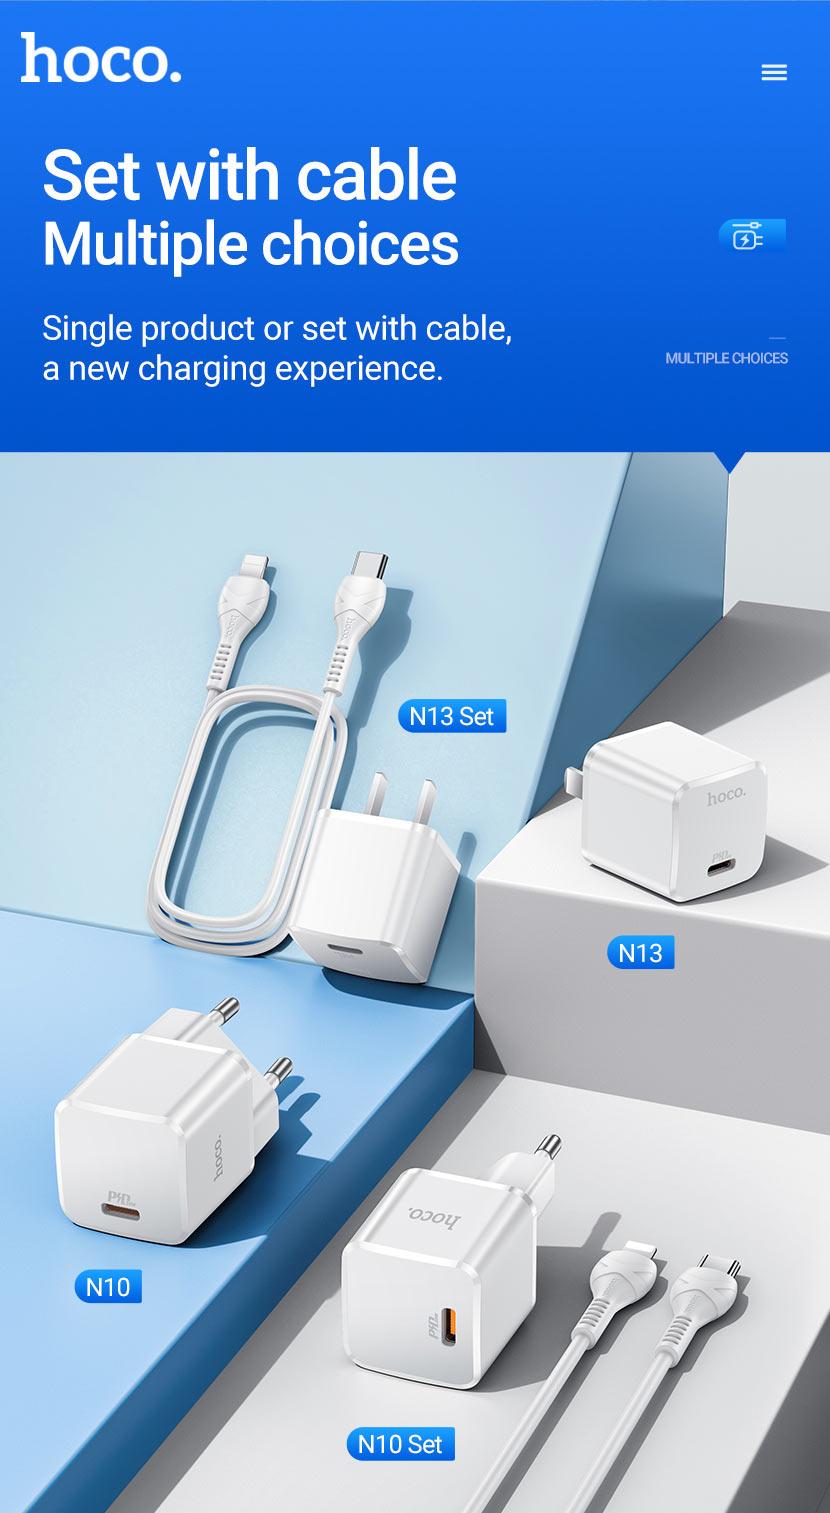 hoco news n10 n13 starter single port pd20w wall charger set en